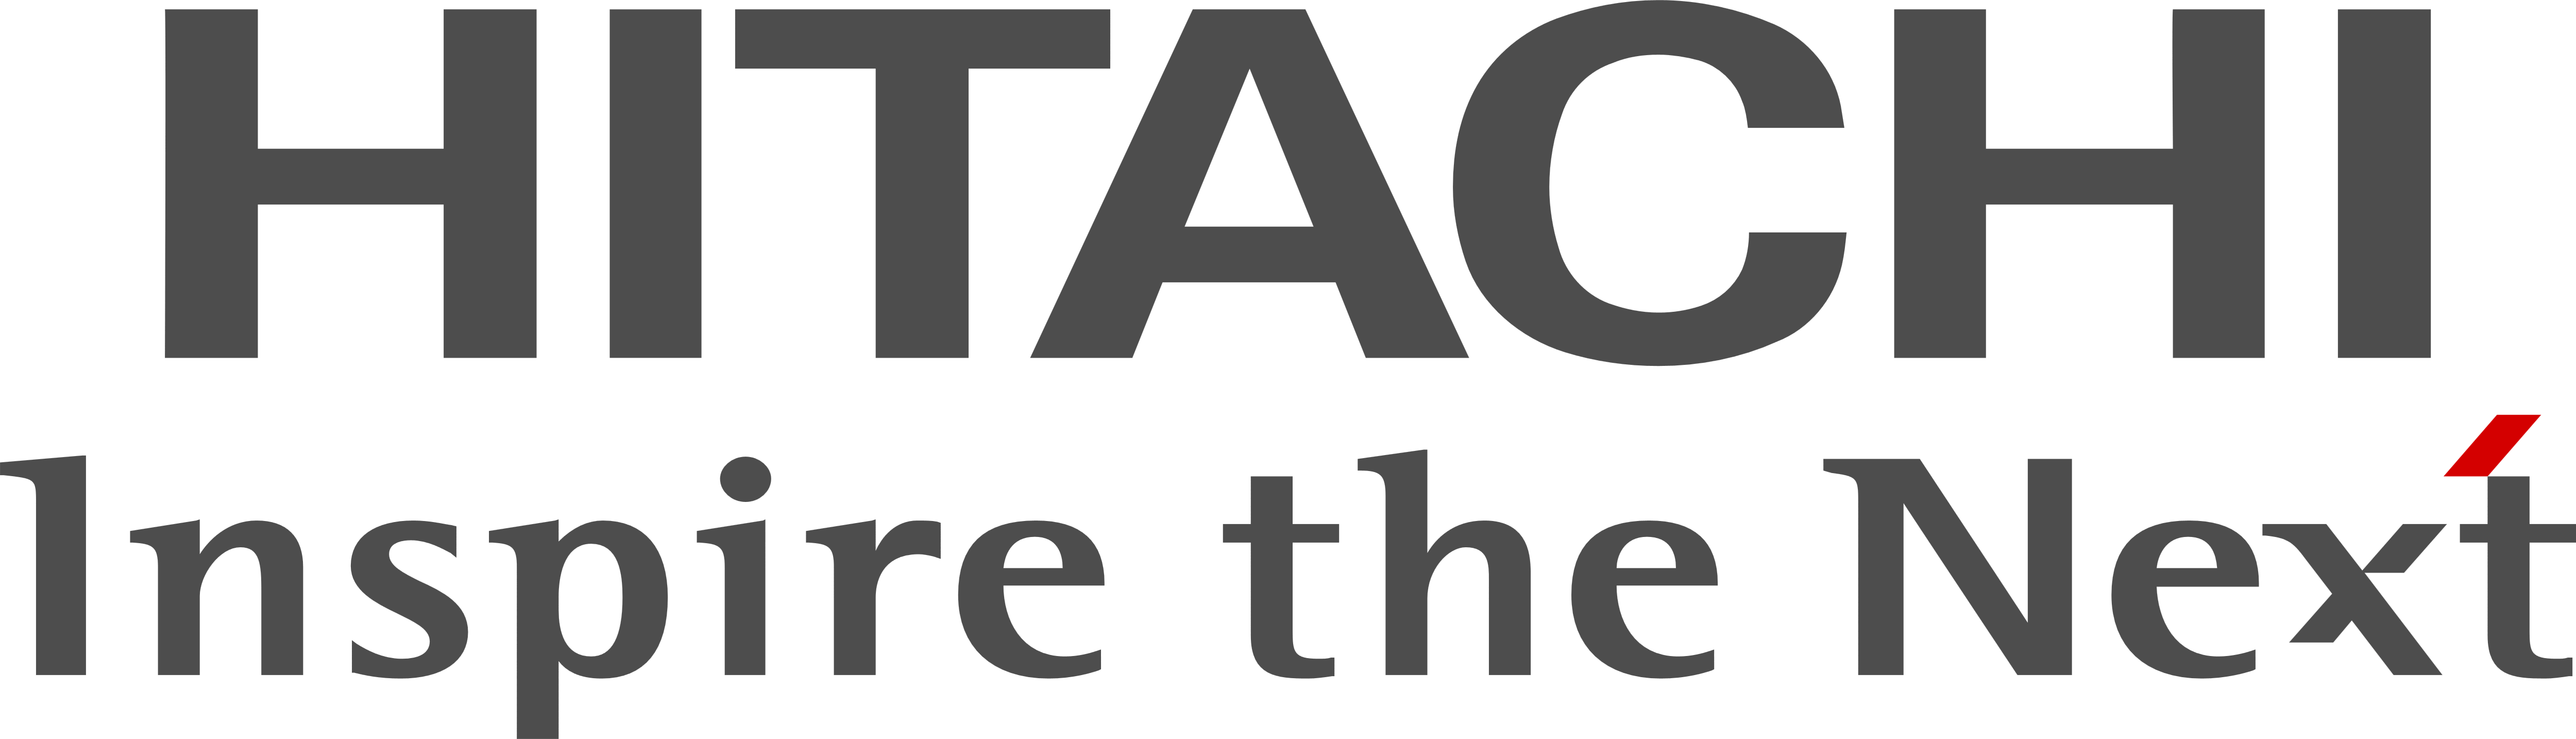 Hitachi_logo_slogan